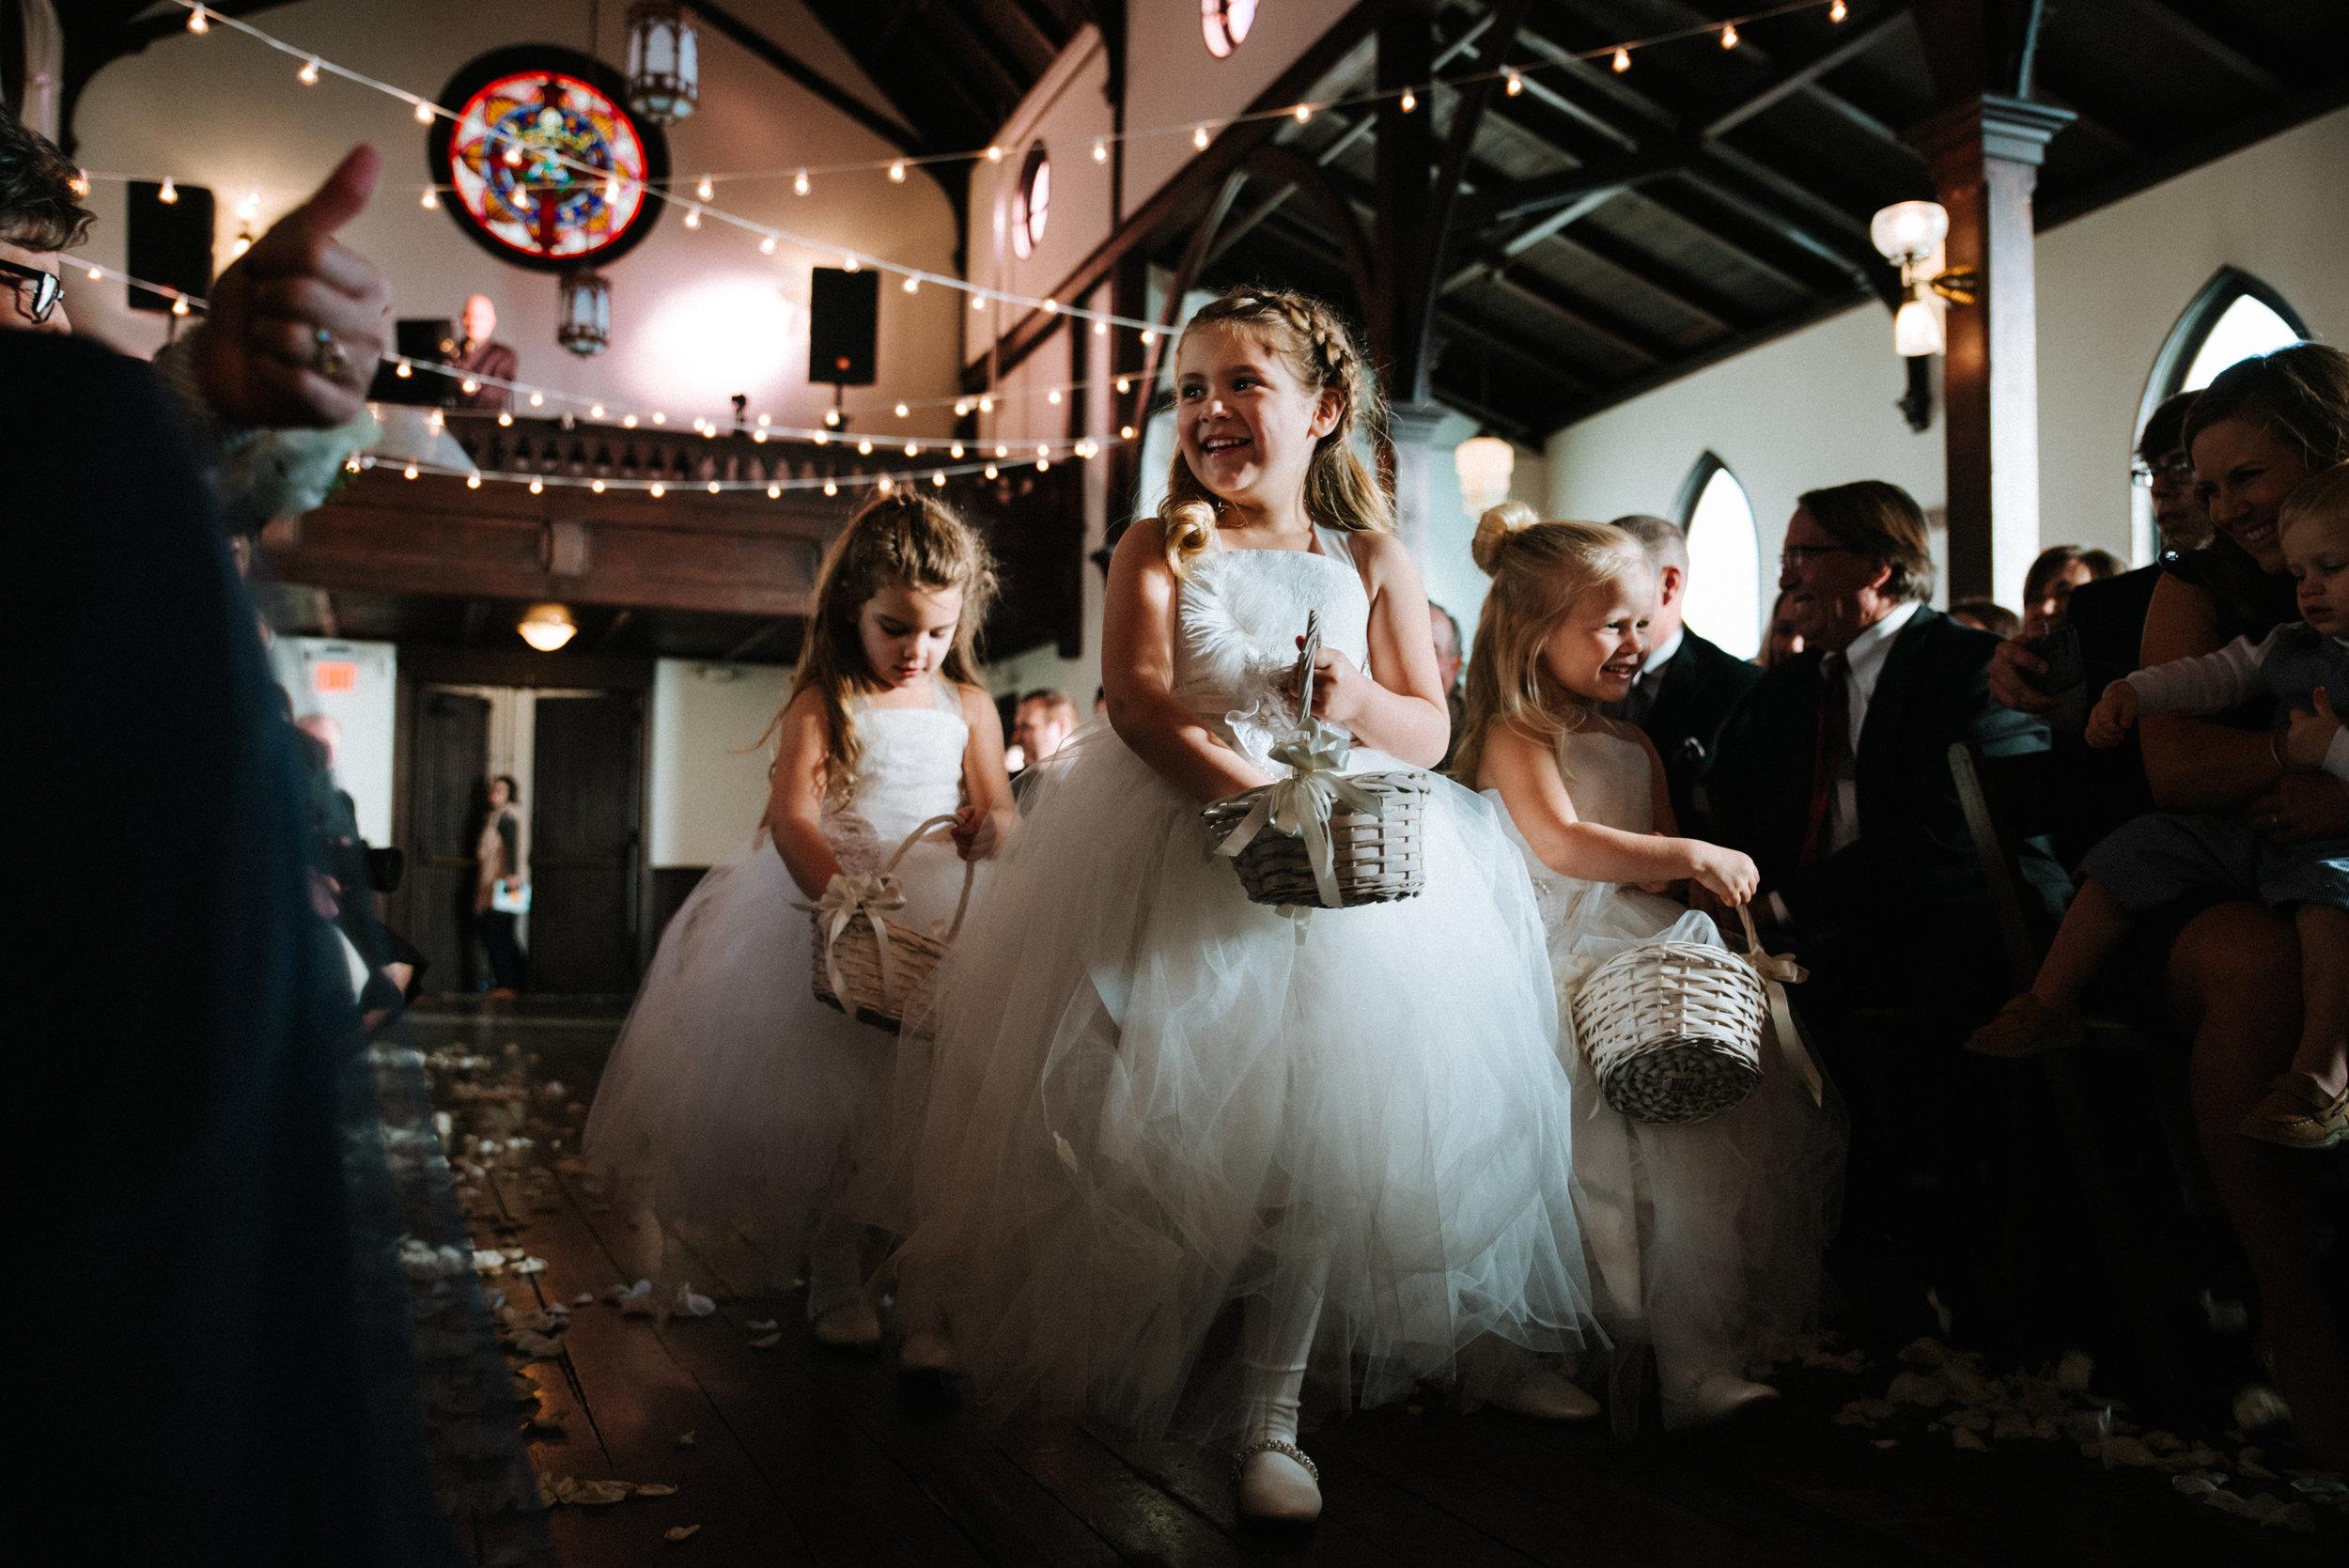 +Raleigh Wedding +North Carolina +Photographer +Wedding Photographer +Engagement Photographer +All Saints Chapel-6720.jpg